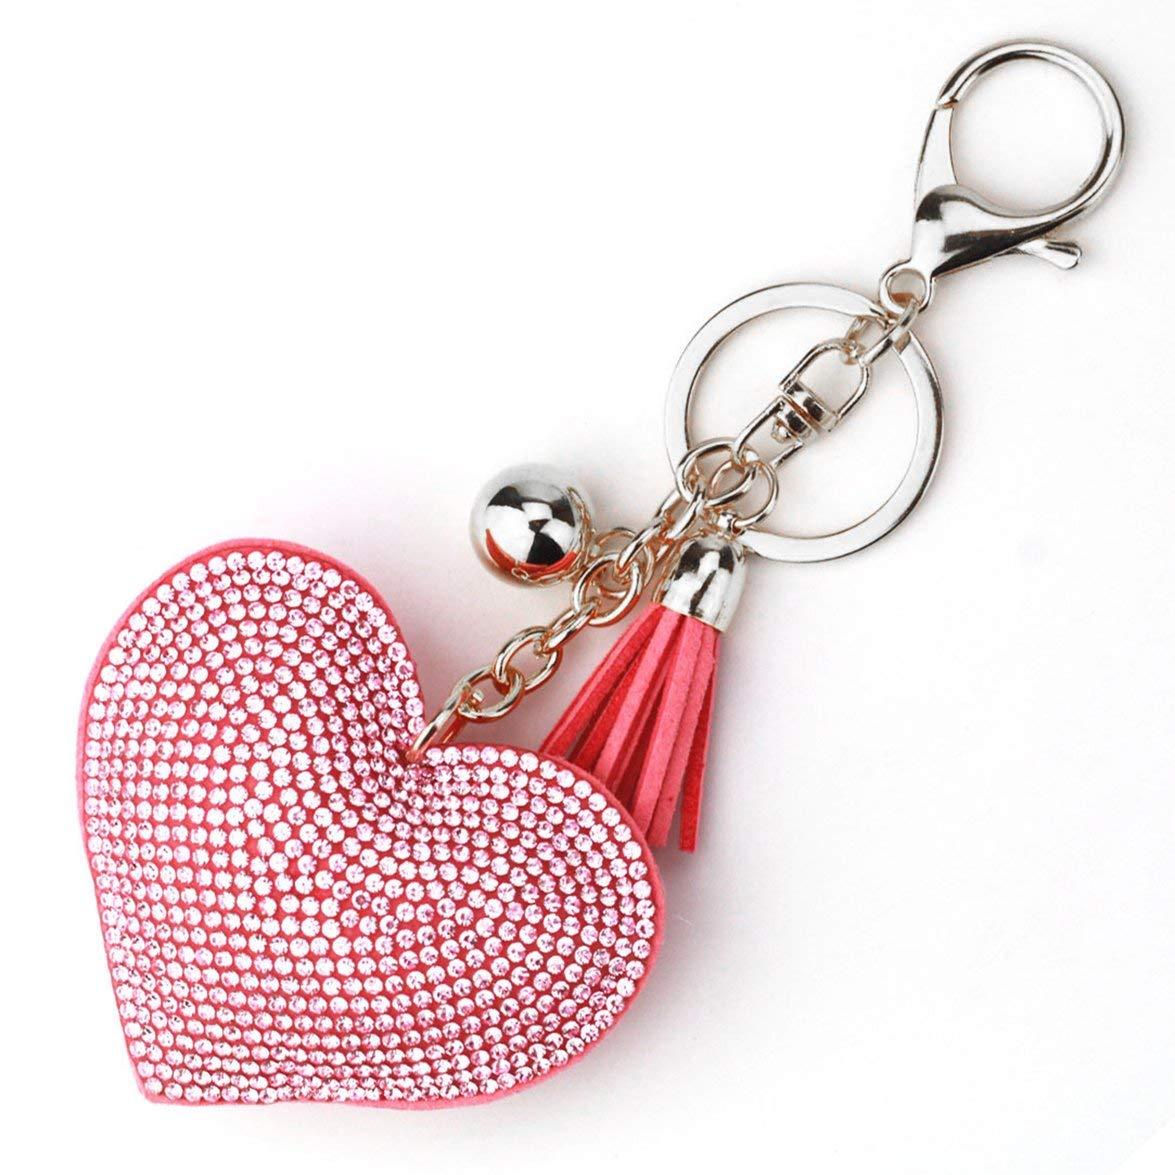 MqbY Romantic Design Love Heart Keychain Women Rhinestone Beads Key Ring Handbag Pendant Long Tassel Keyring Jewelry White /& Black